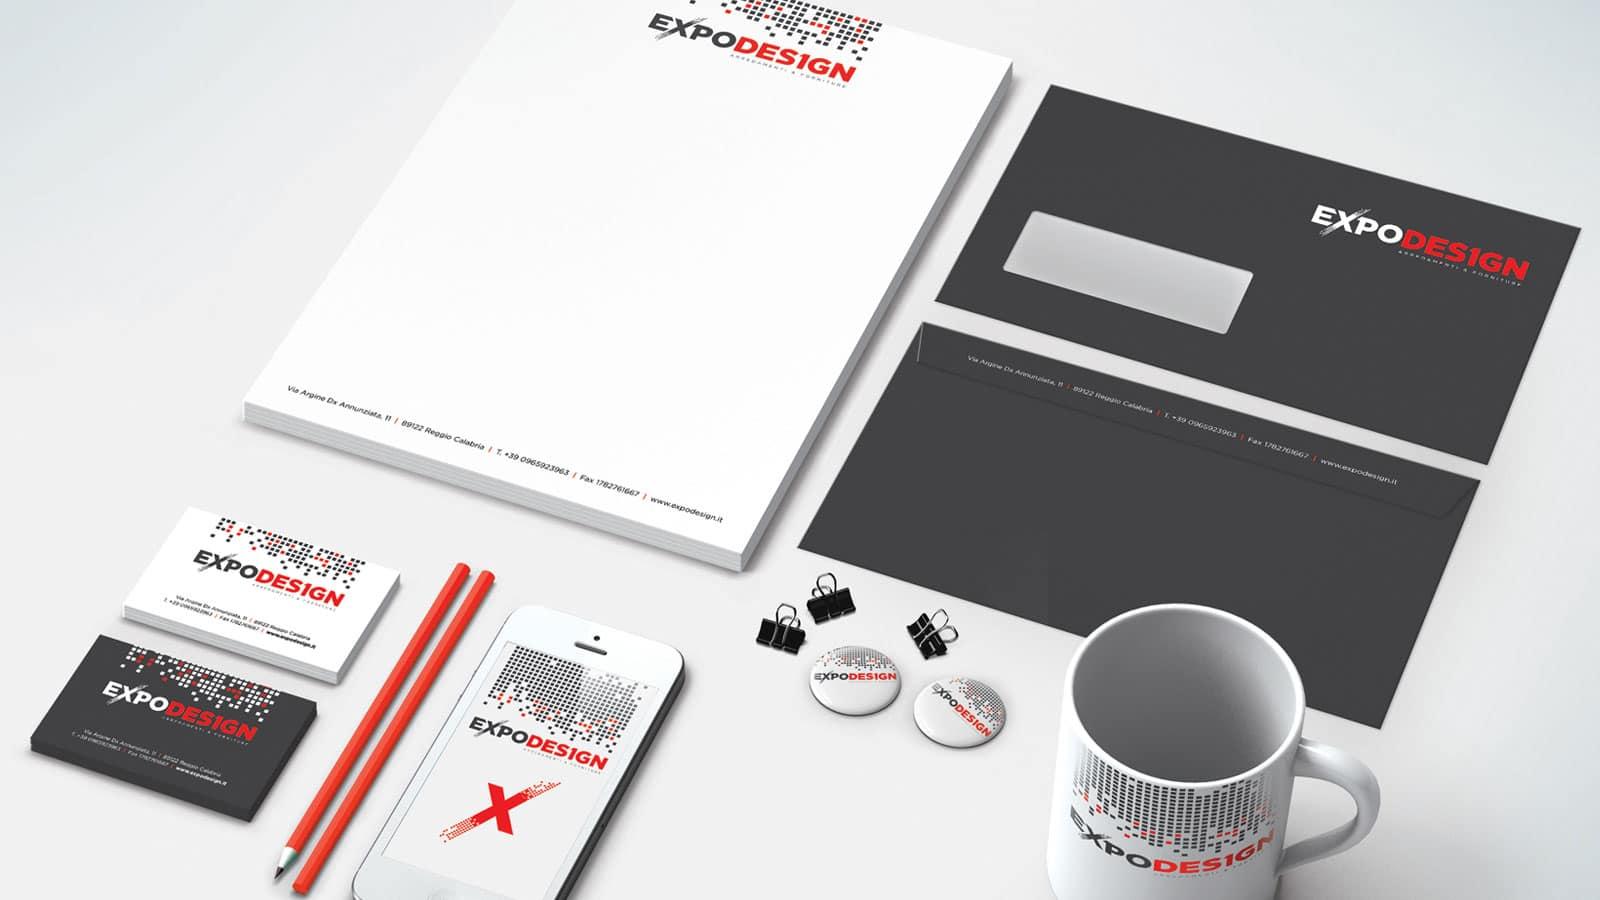 bisestyle-idee-expodesign-slider-2